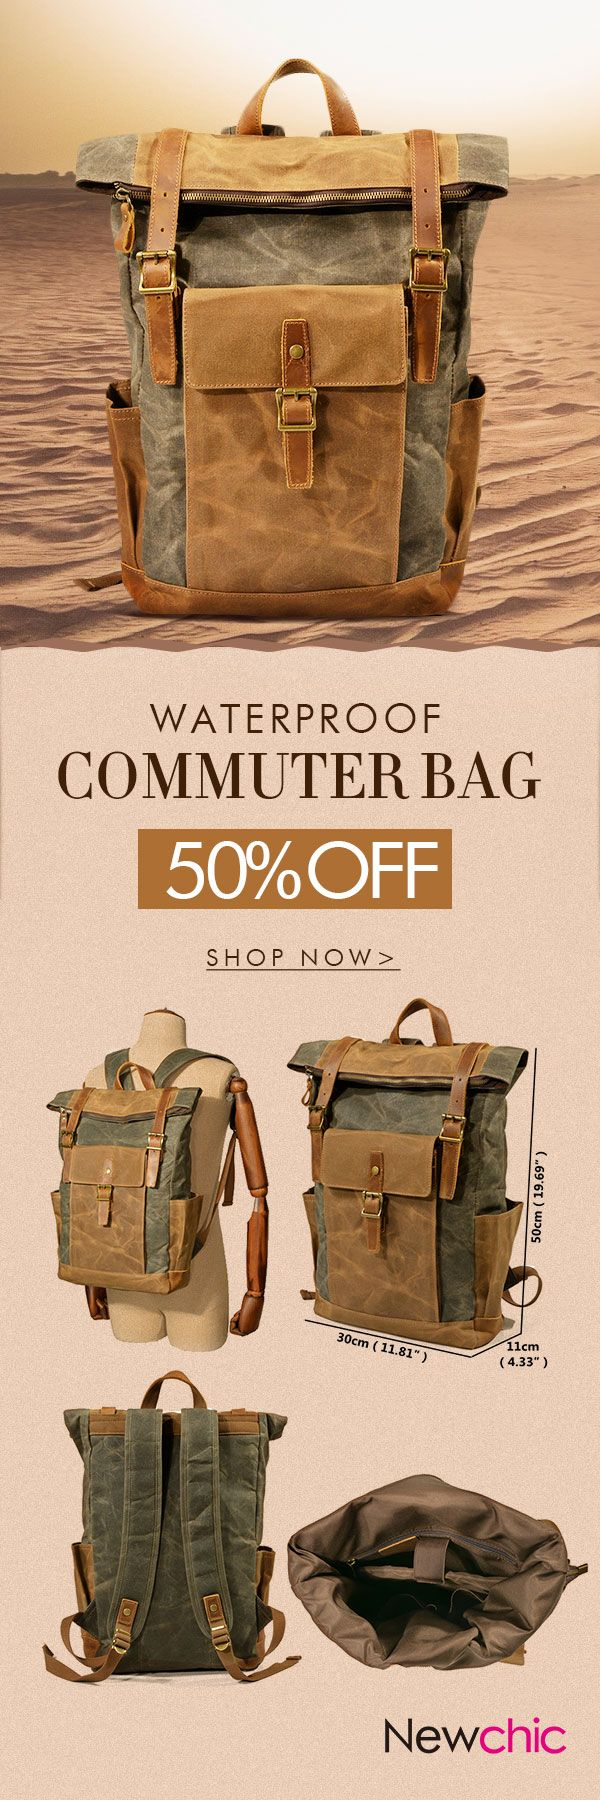 Men Vintage Canvas Casual Travel Large Capacity Waterproof Commuter Bag Backpack